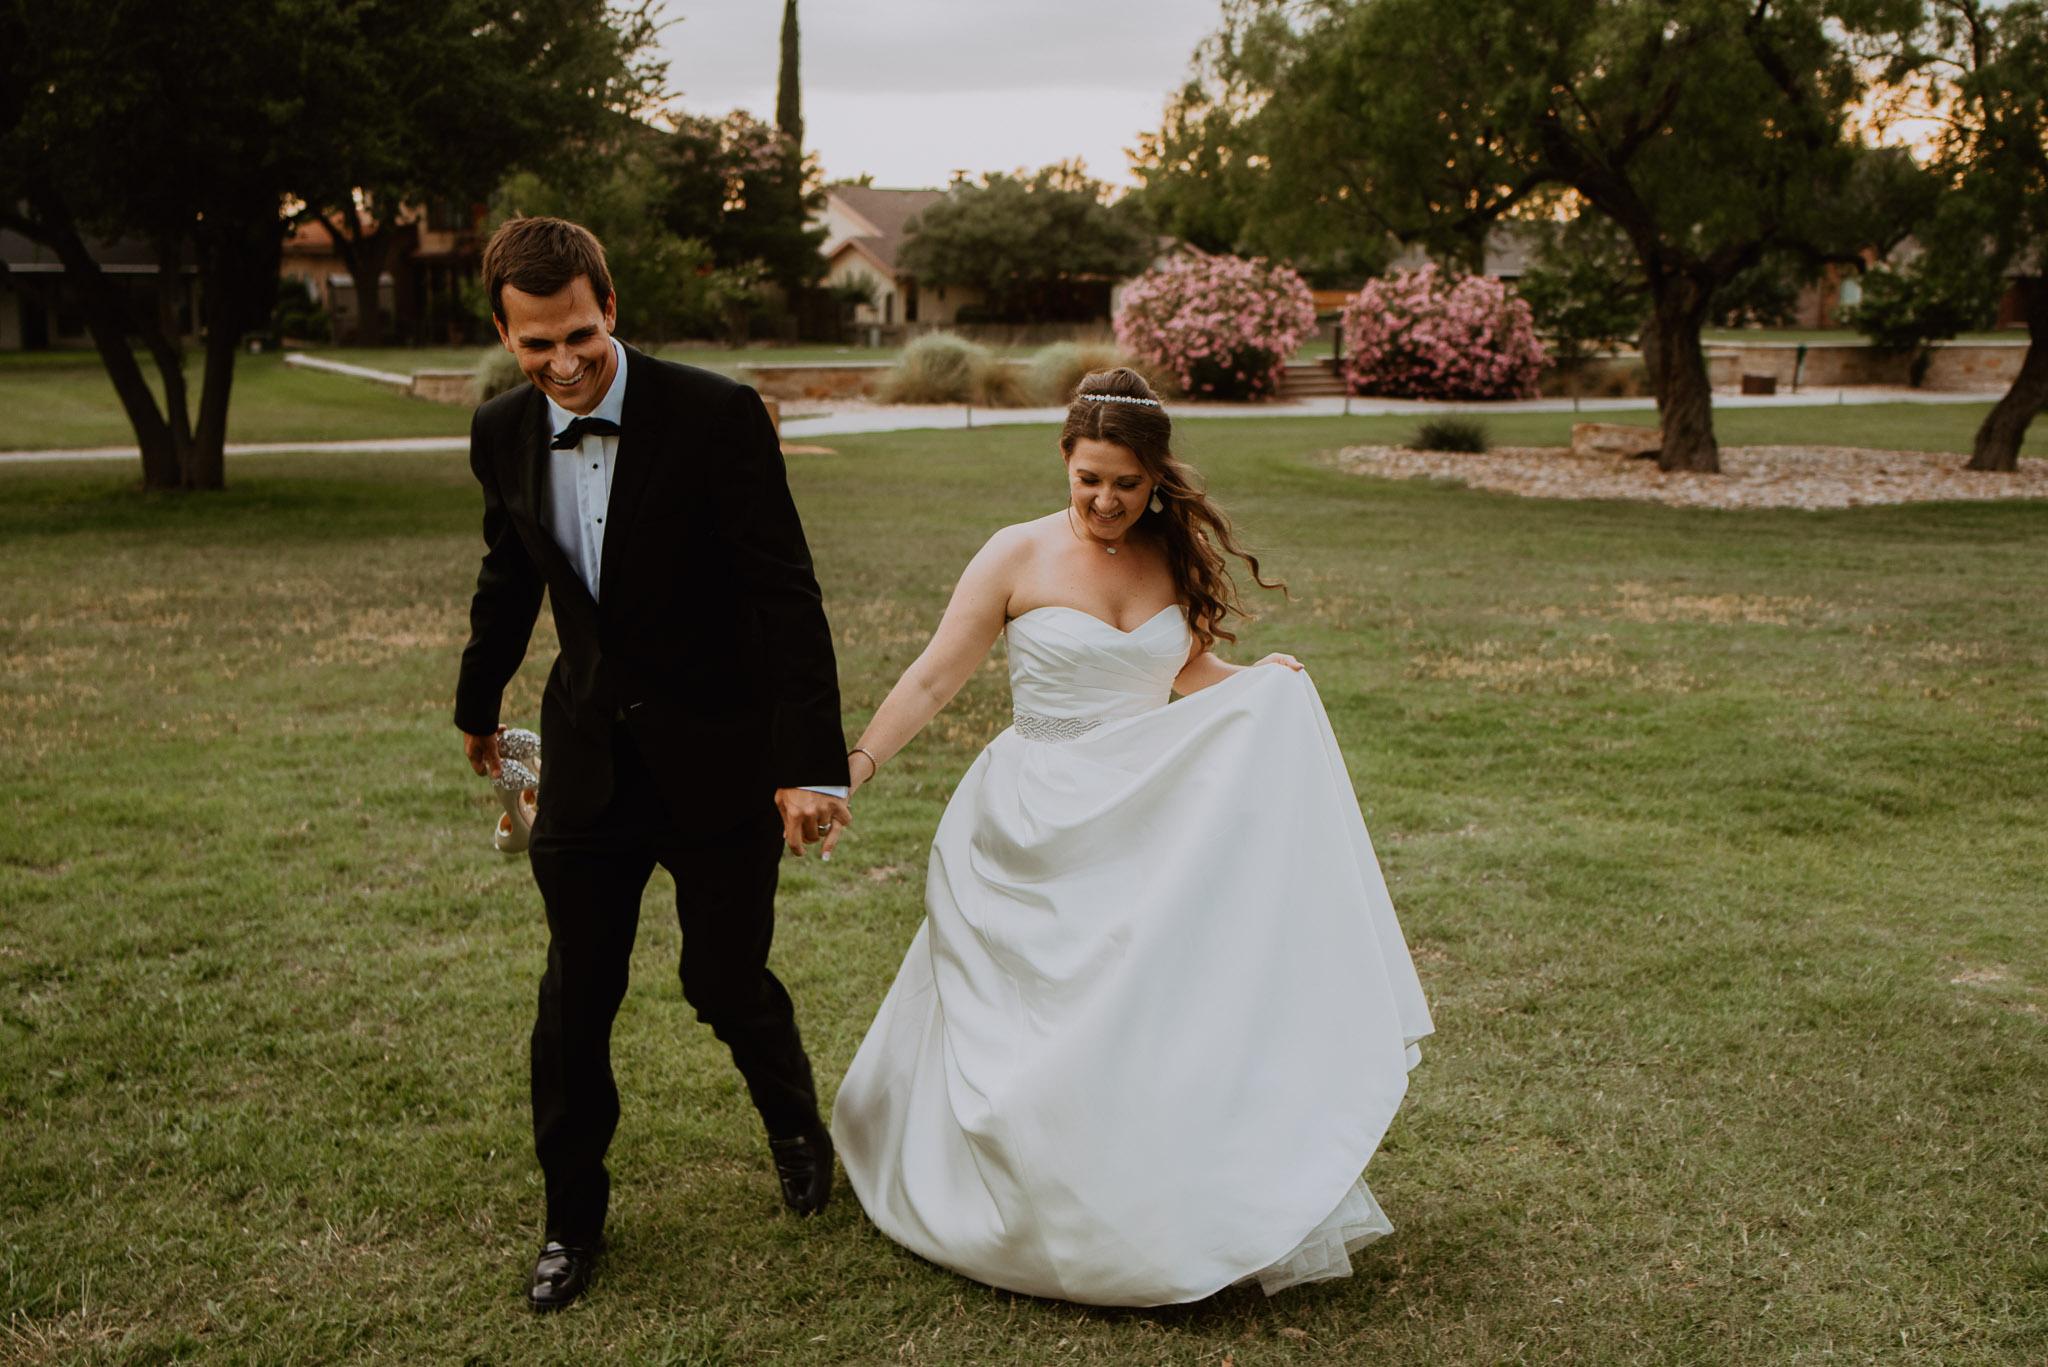 Bentwood-country-club-wedding-shea-tyson-0027.jpg